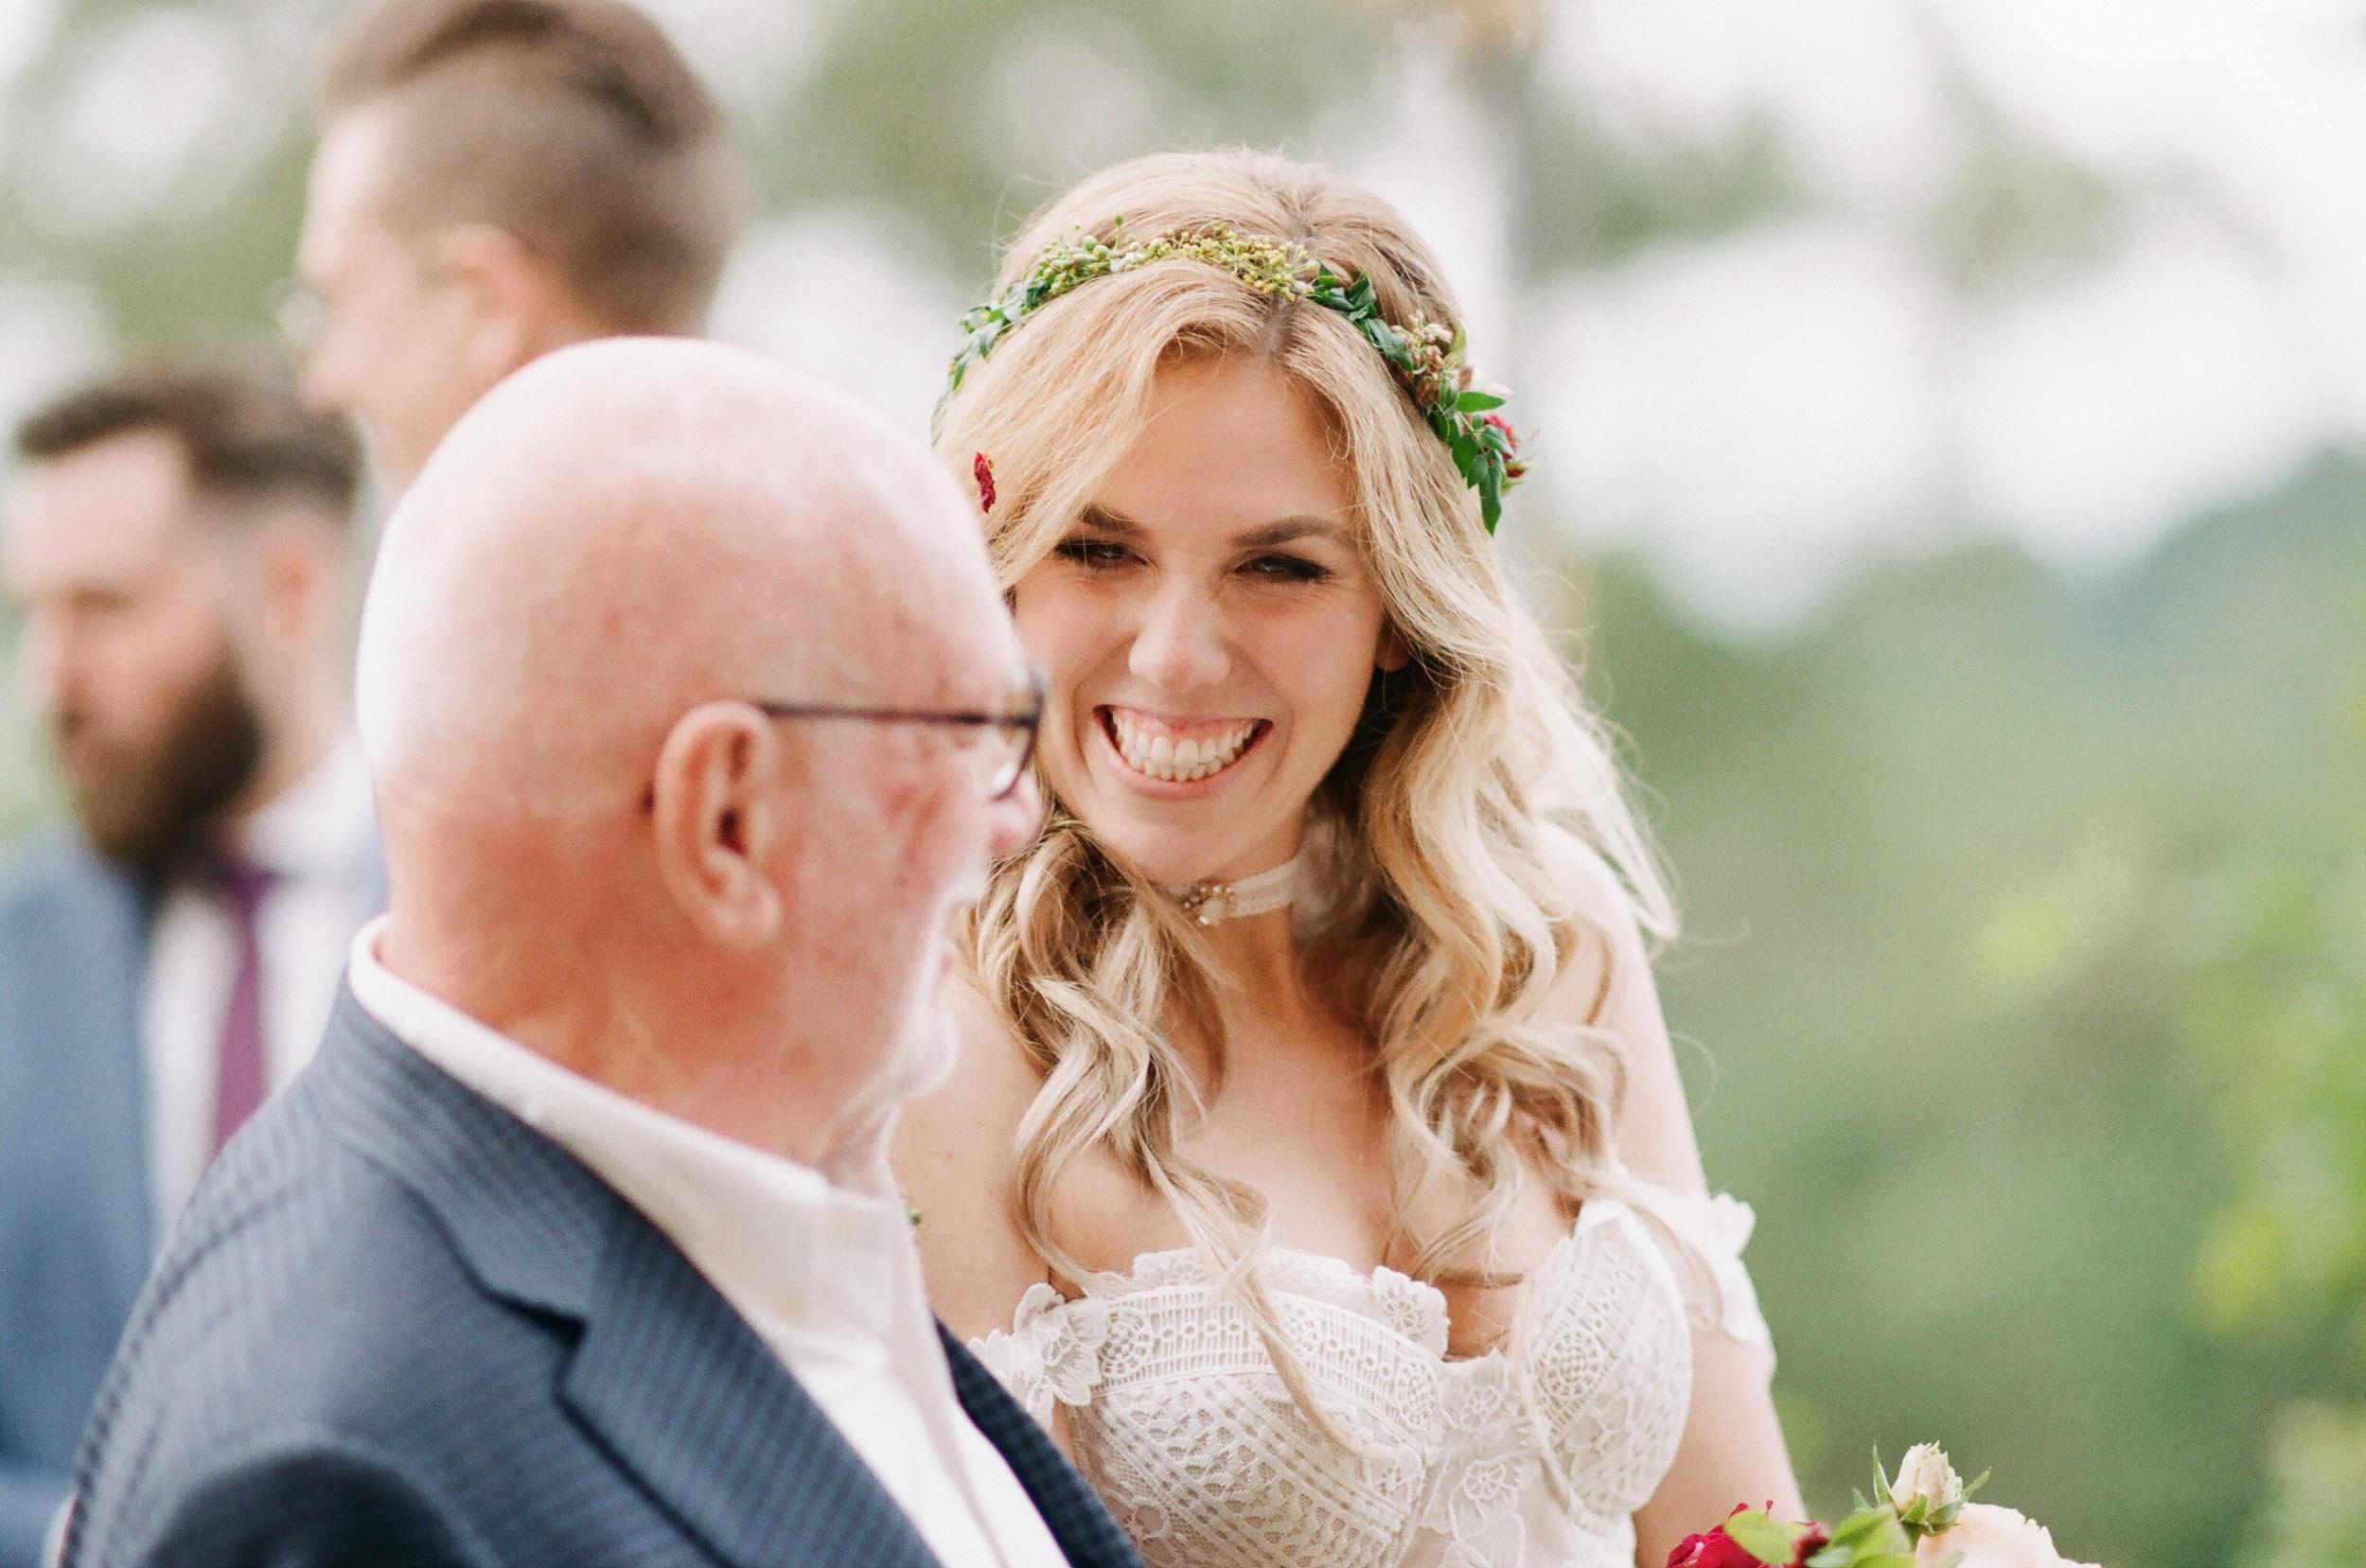 wedding (10 of 24) - 000053030032.jpg